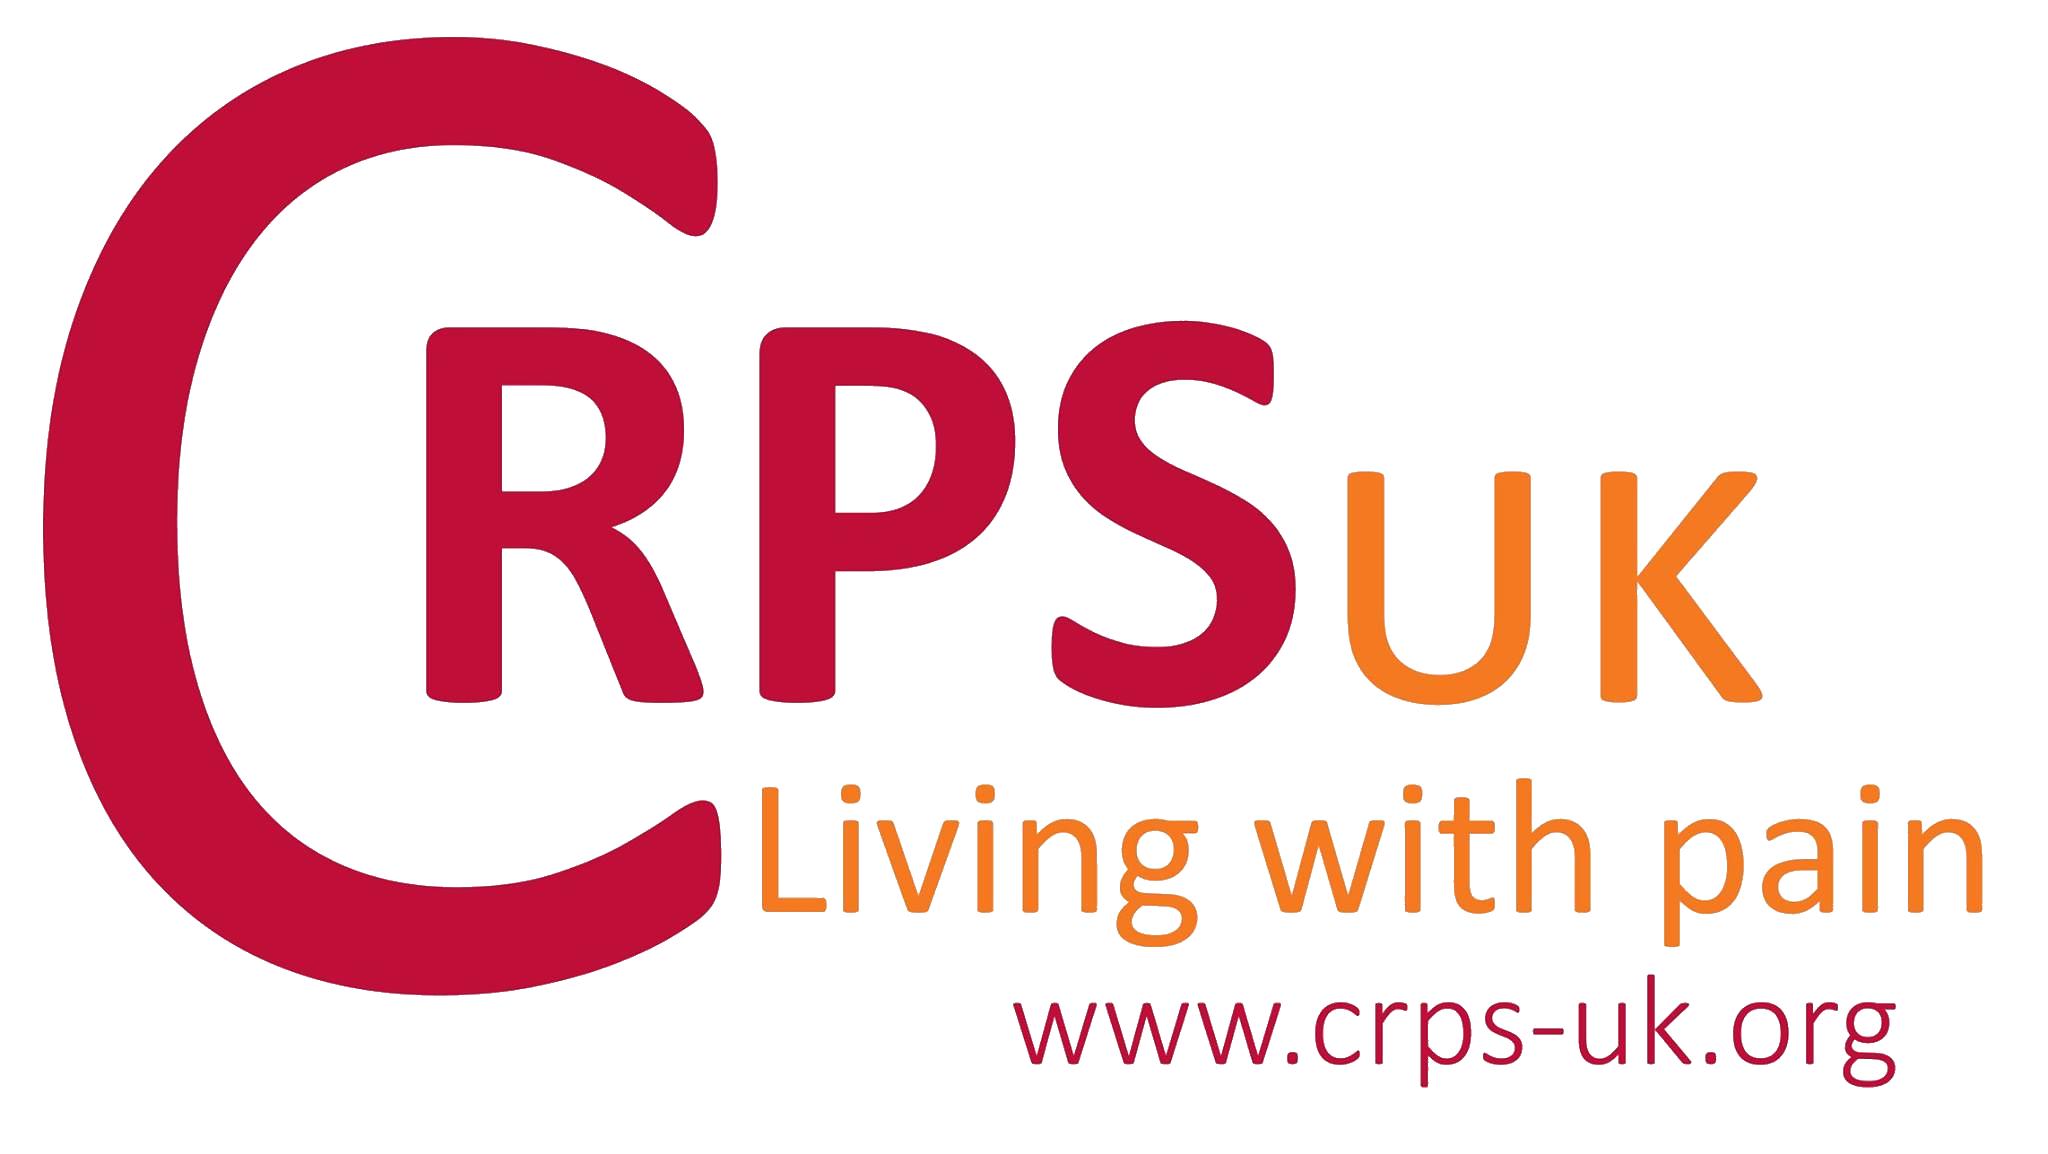 Copy of CRPS